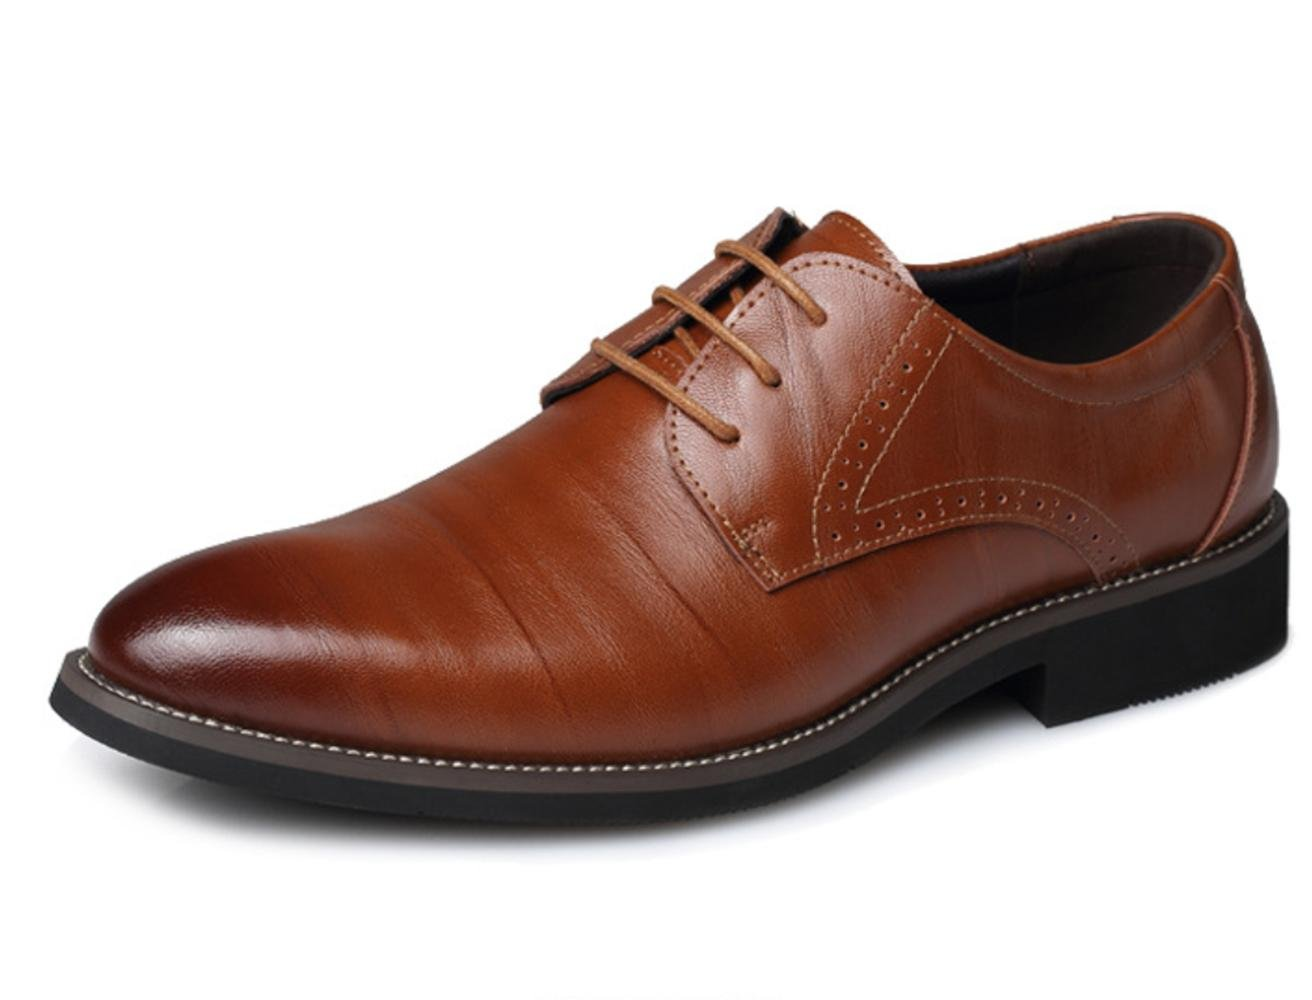 XDGG Männer Leder Schuhe Business Casual Spitz Zehe Hochzeit Schuhe Groß Größe Schuhe , Gelb , 38